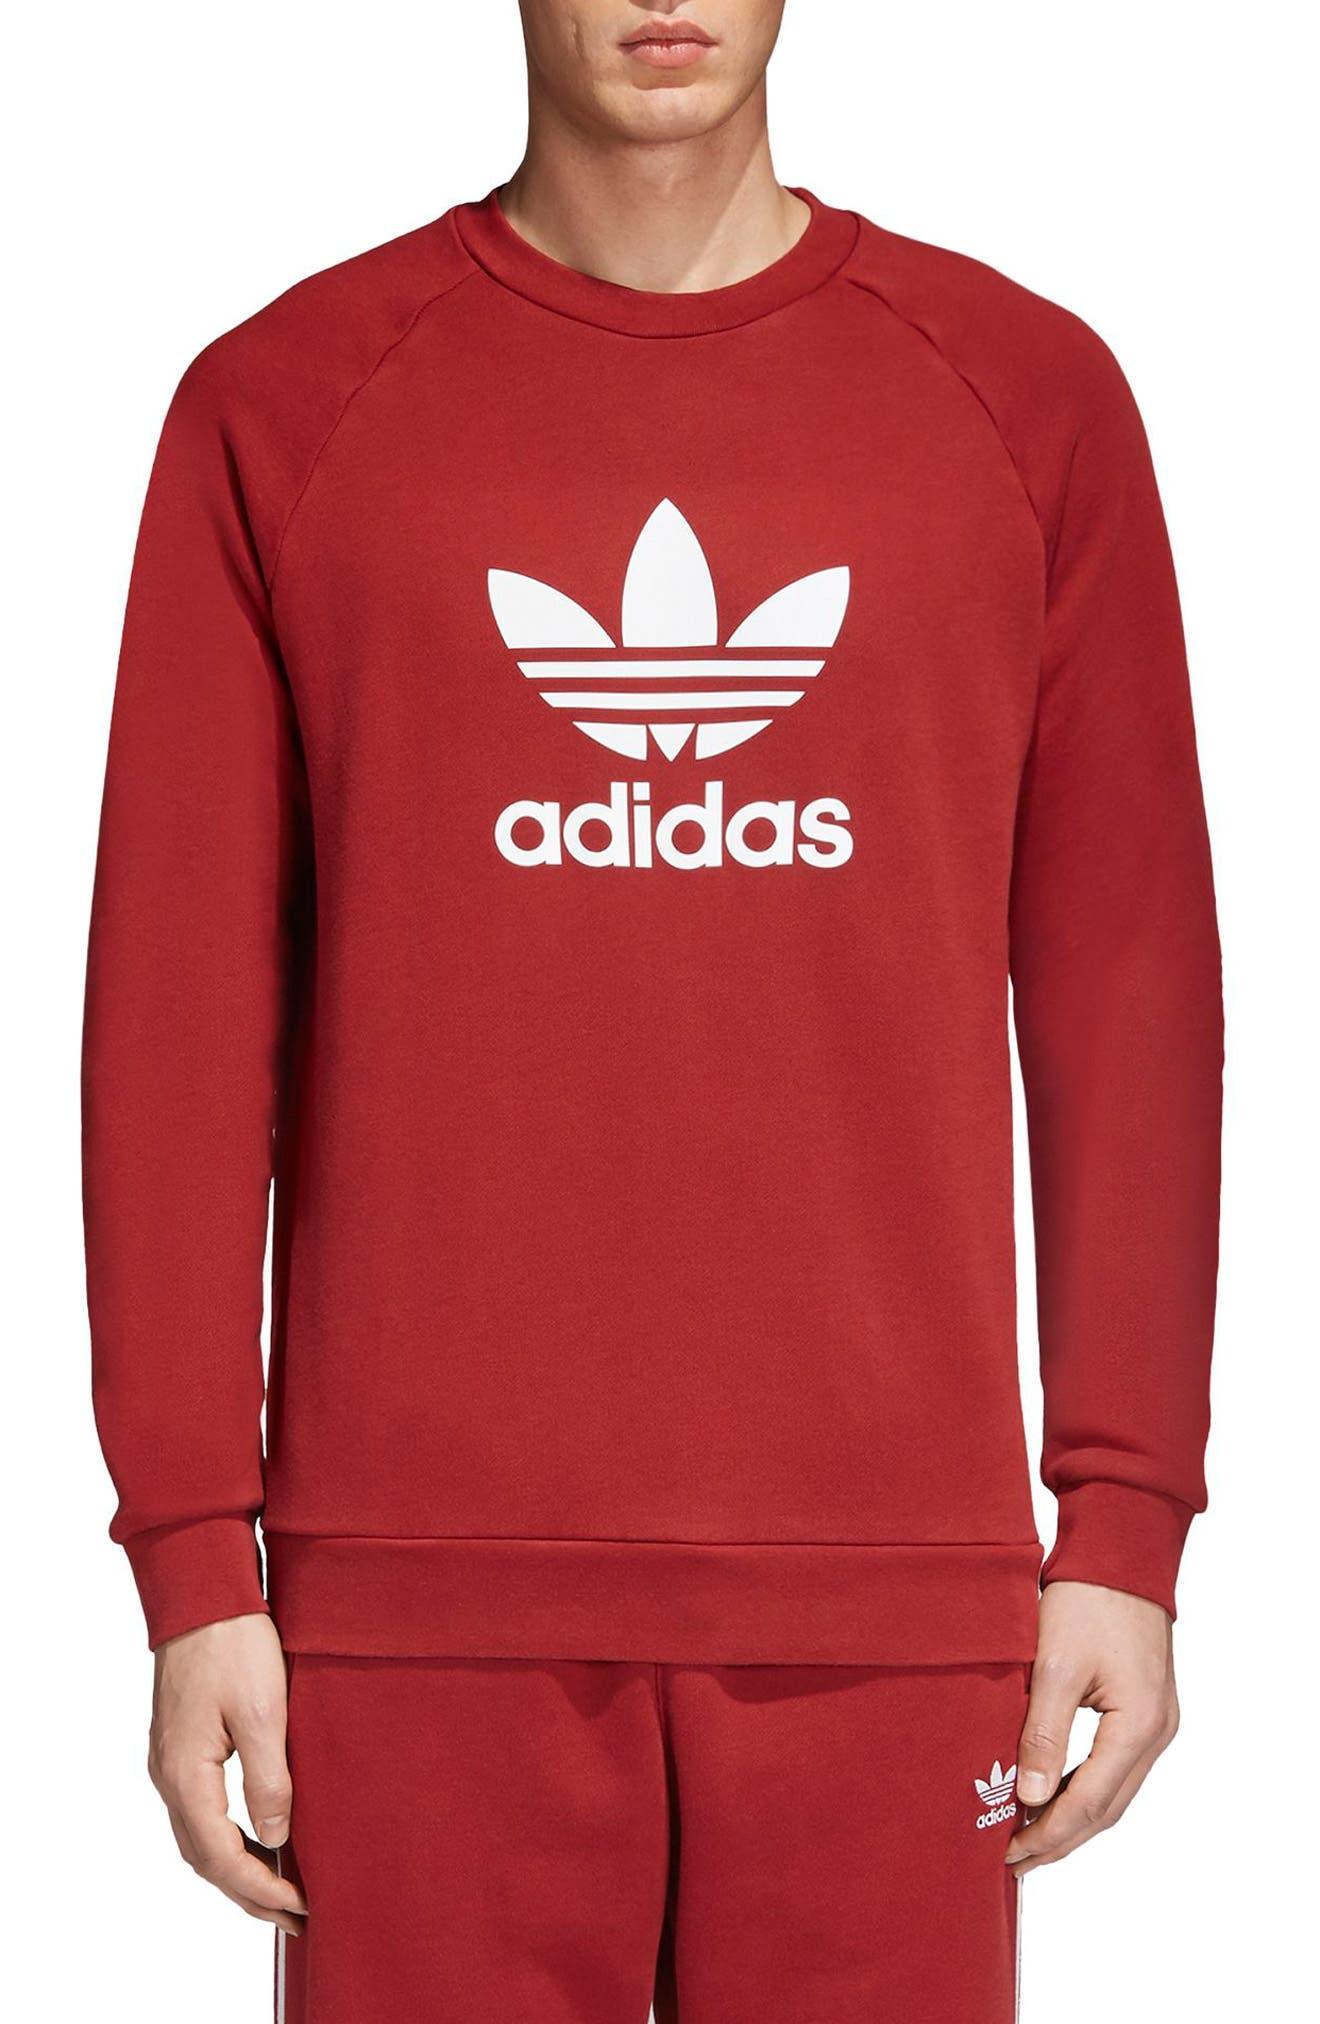 adidas Trefoil Crewneck Sweatshirt,                             Main thumbnail 2, color,